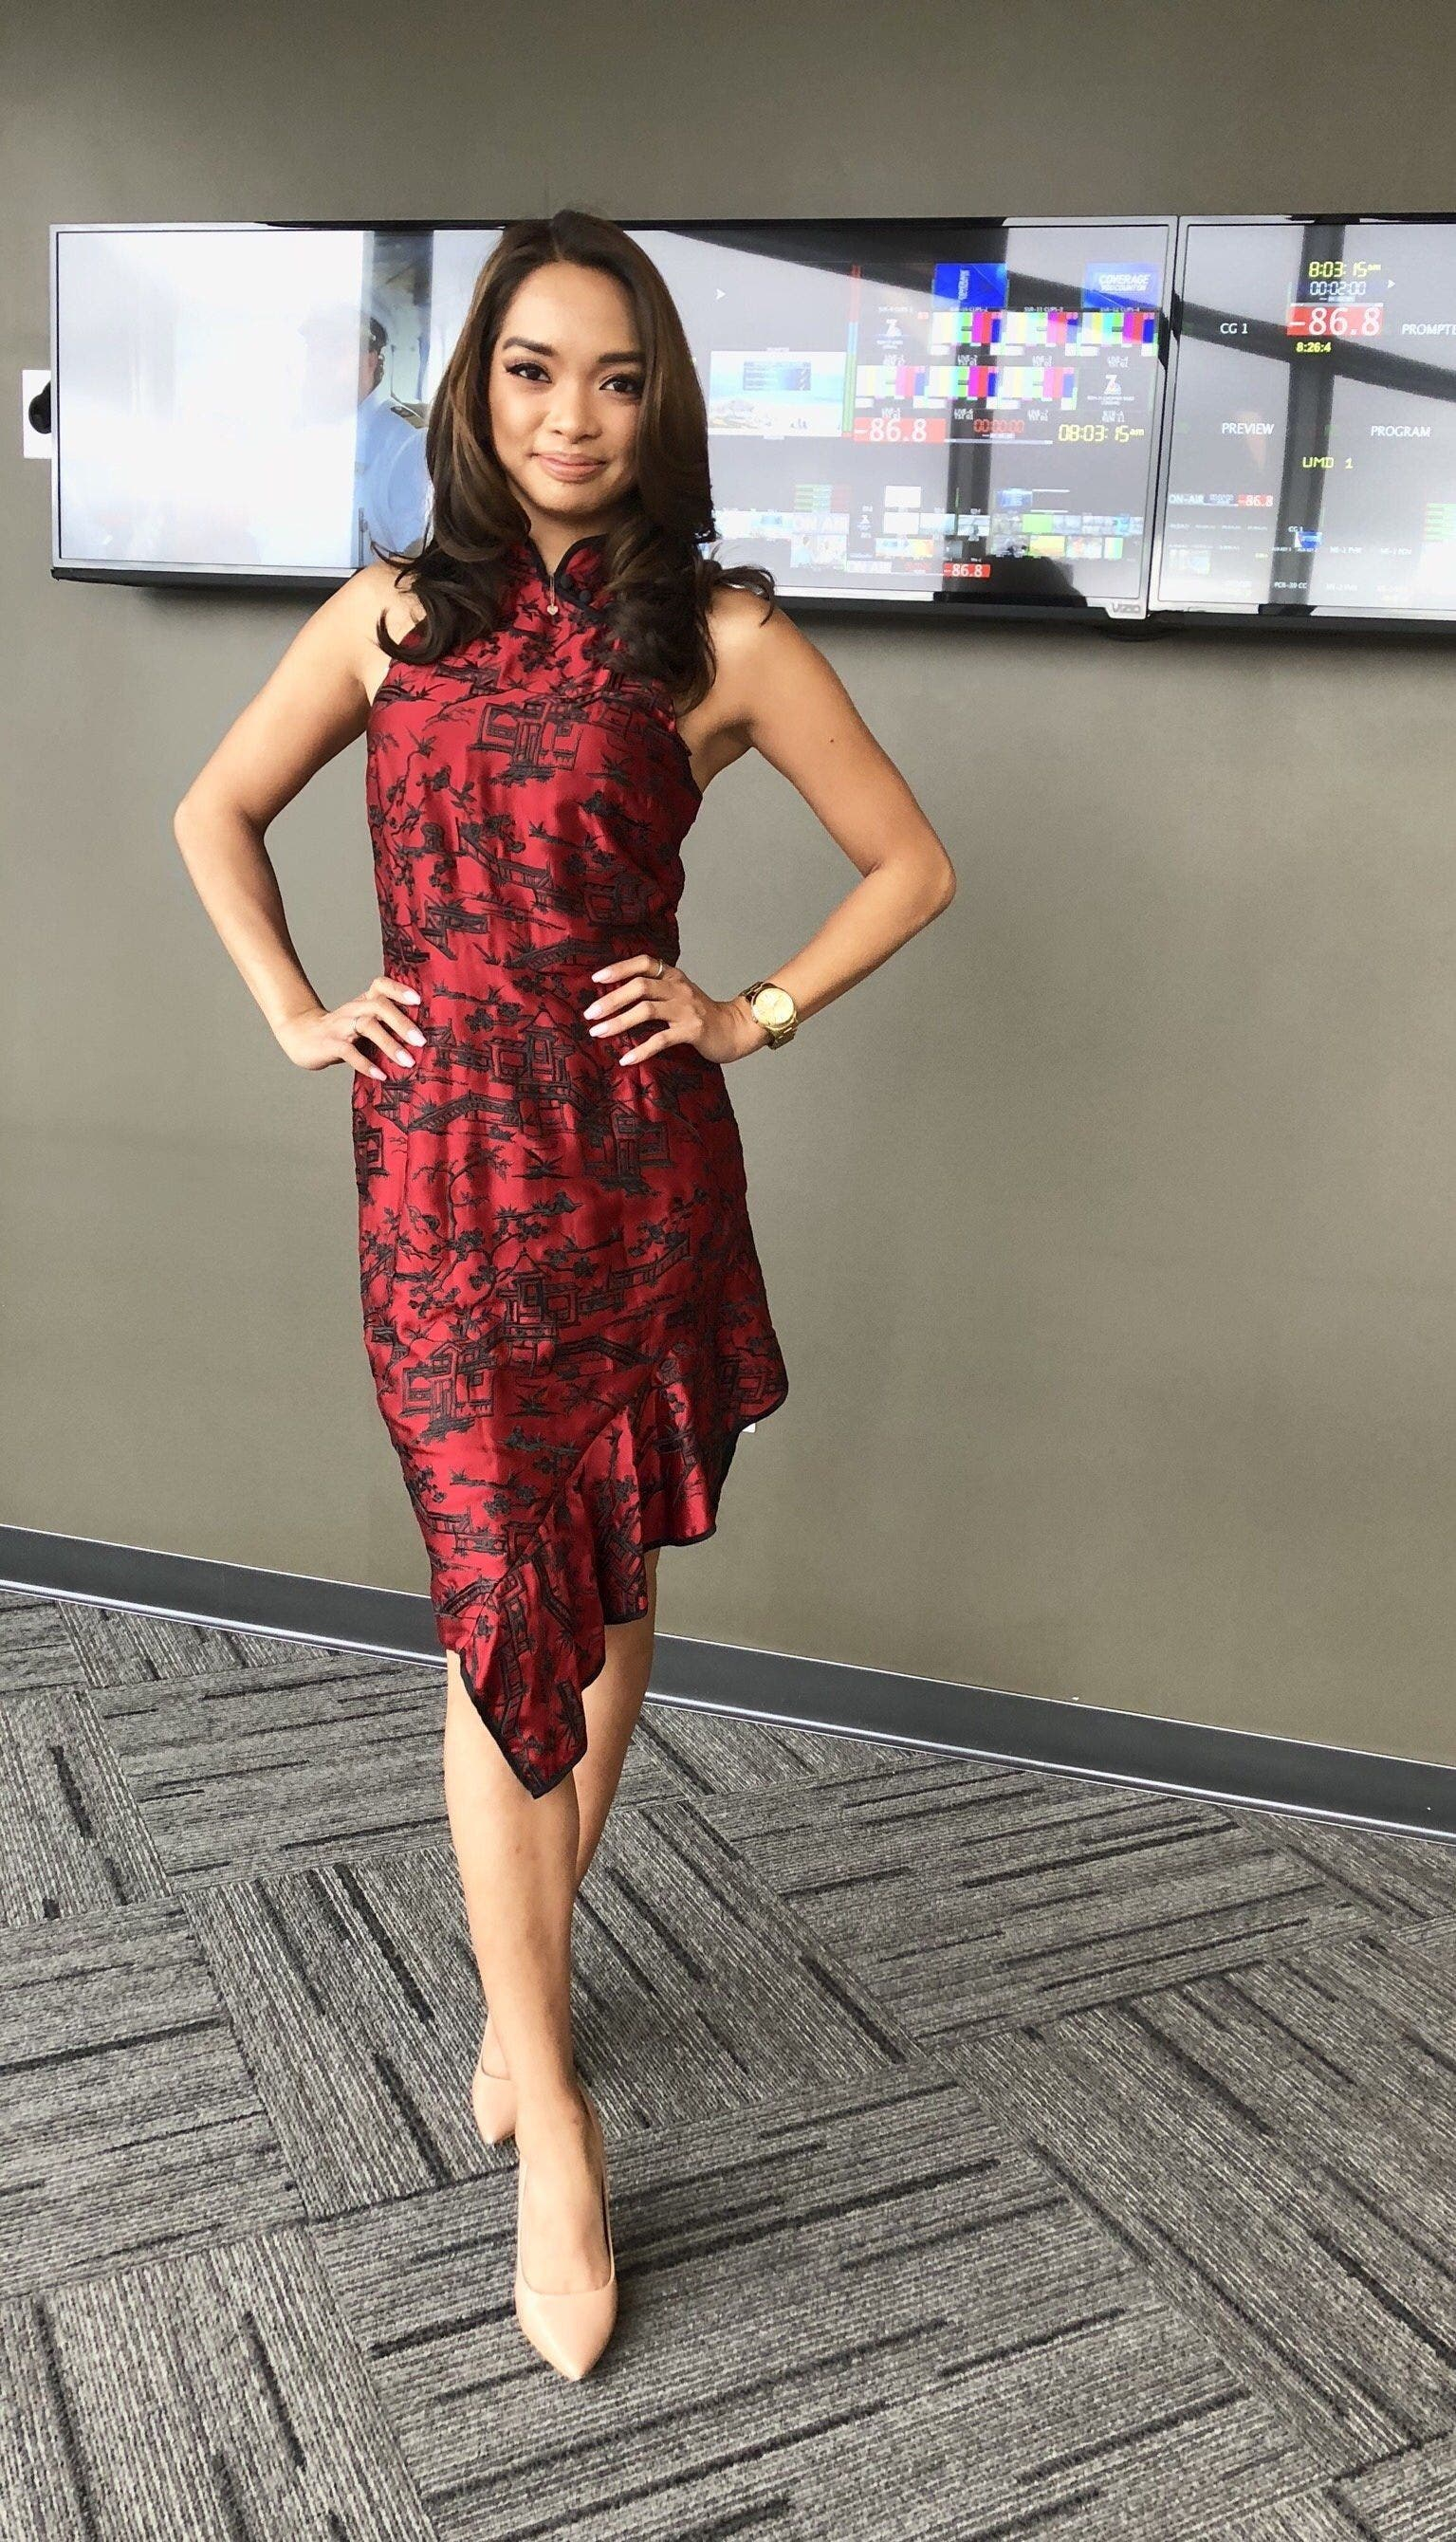 a4d4201fc Red Cheongsam Dress by Josie Natori for $90   Rent the Runway